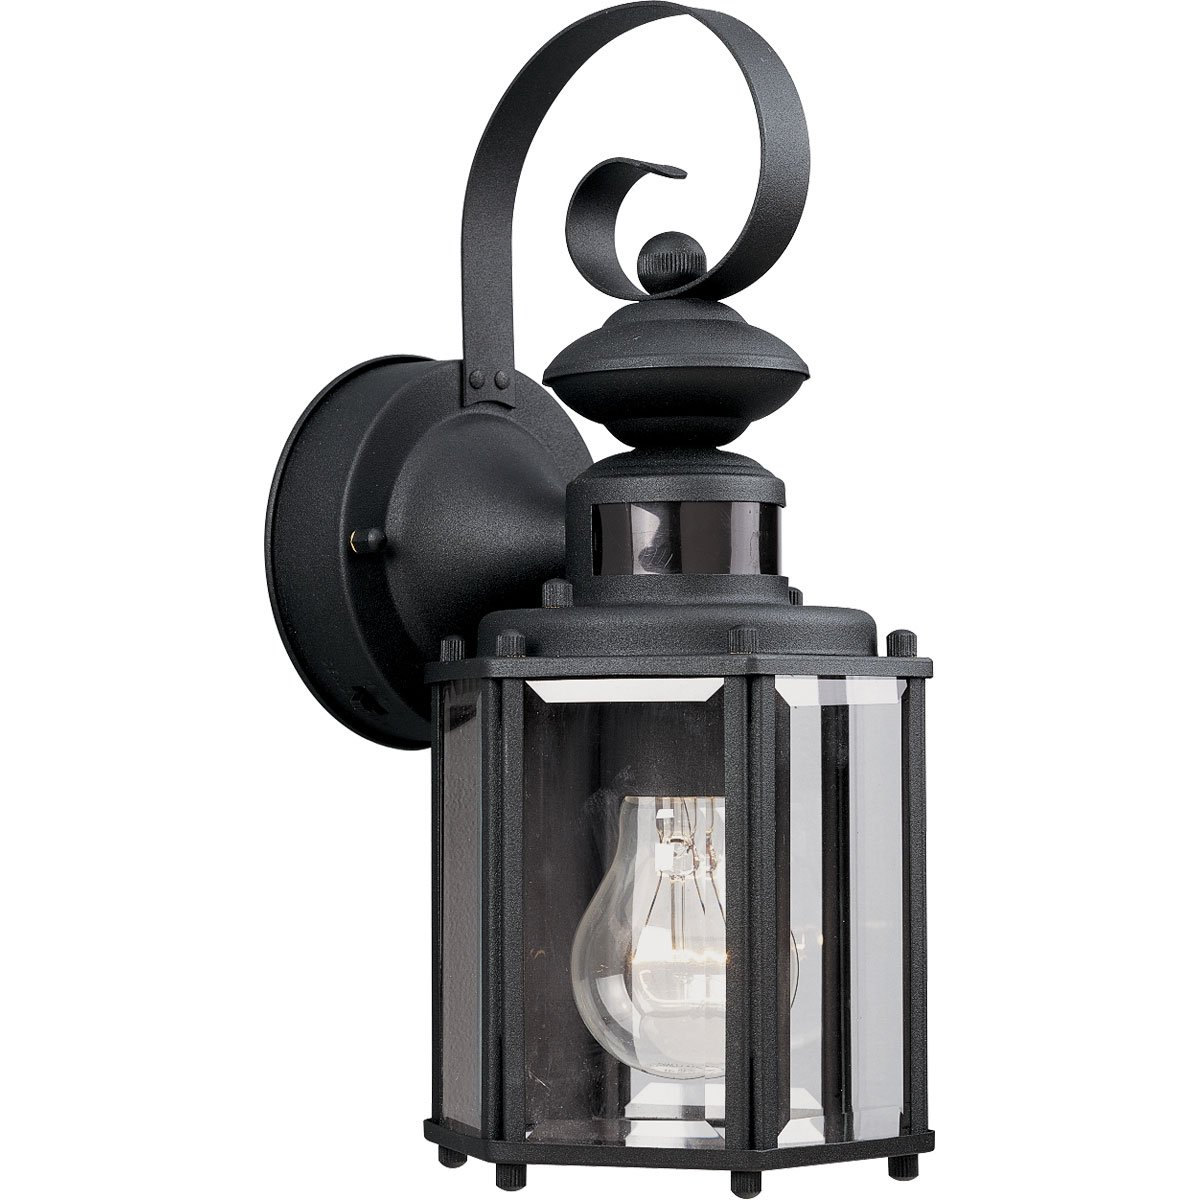 Progress lighting p5662 31 1 light wall lantern with motion sensor progress lighting p5662 31 1 light wall lantern with motion sensor black wall sconces amazon workwithnaturefo